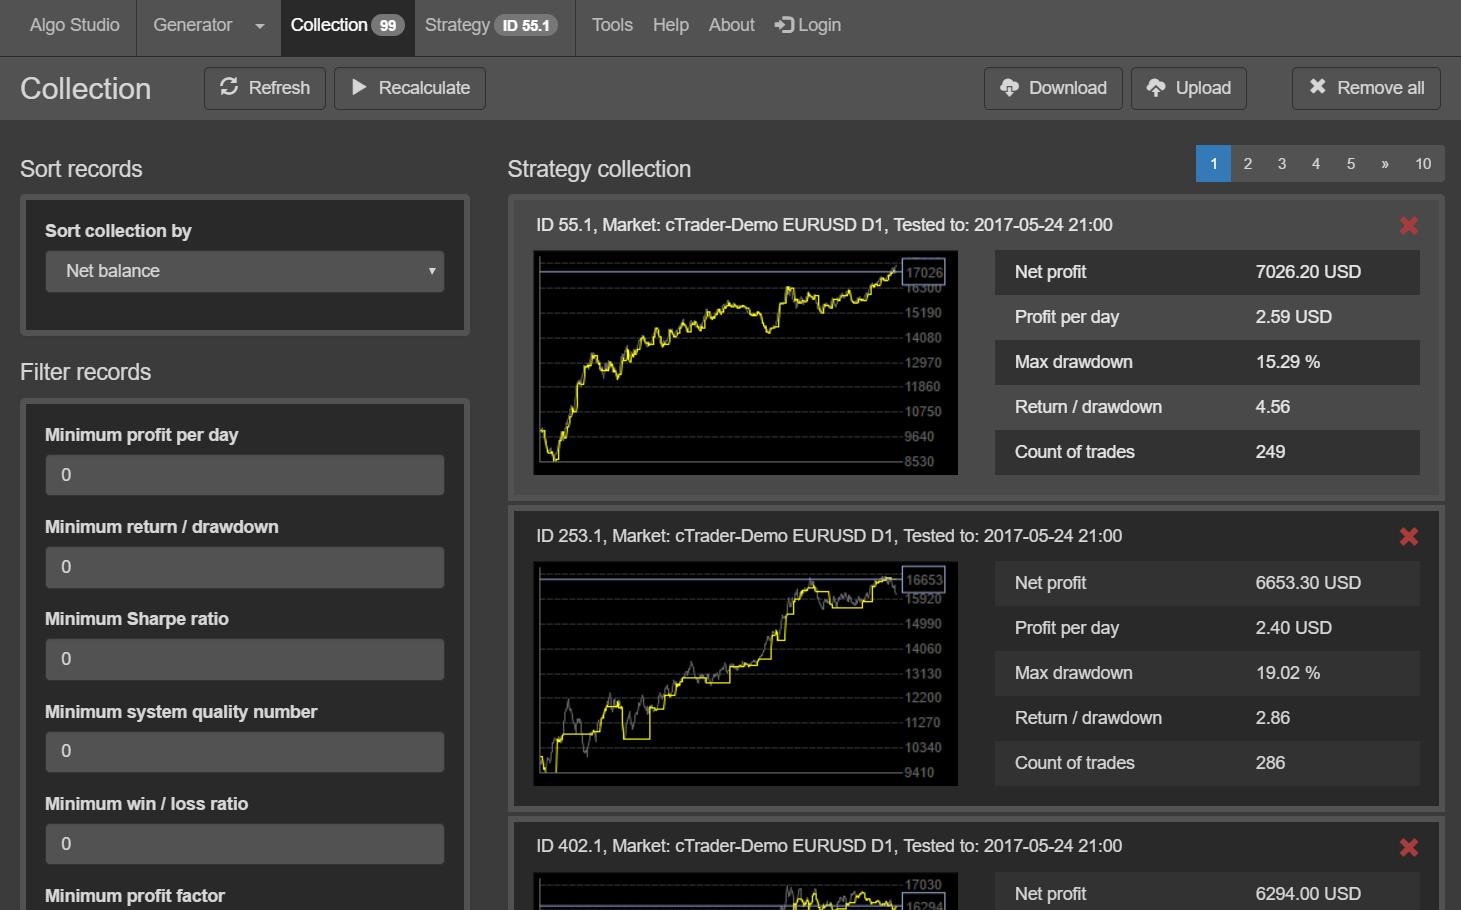 Algo Studio - Collection Screenshot